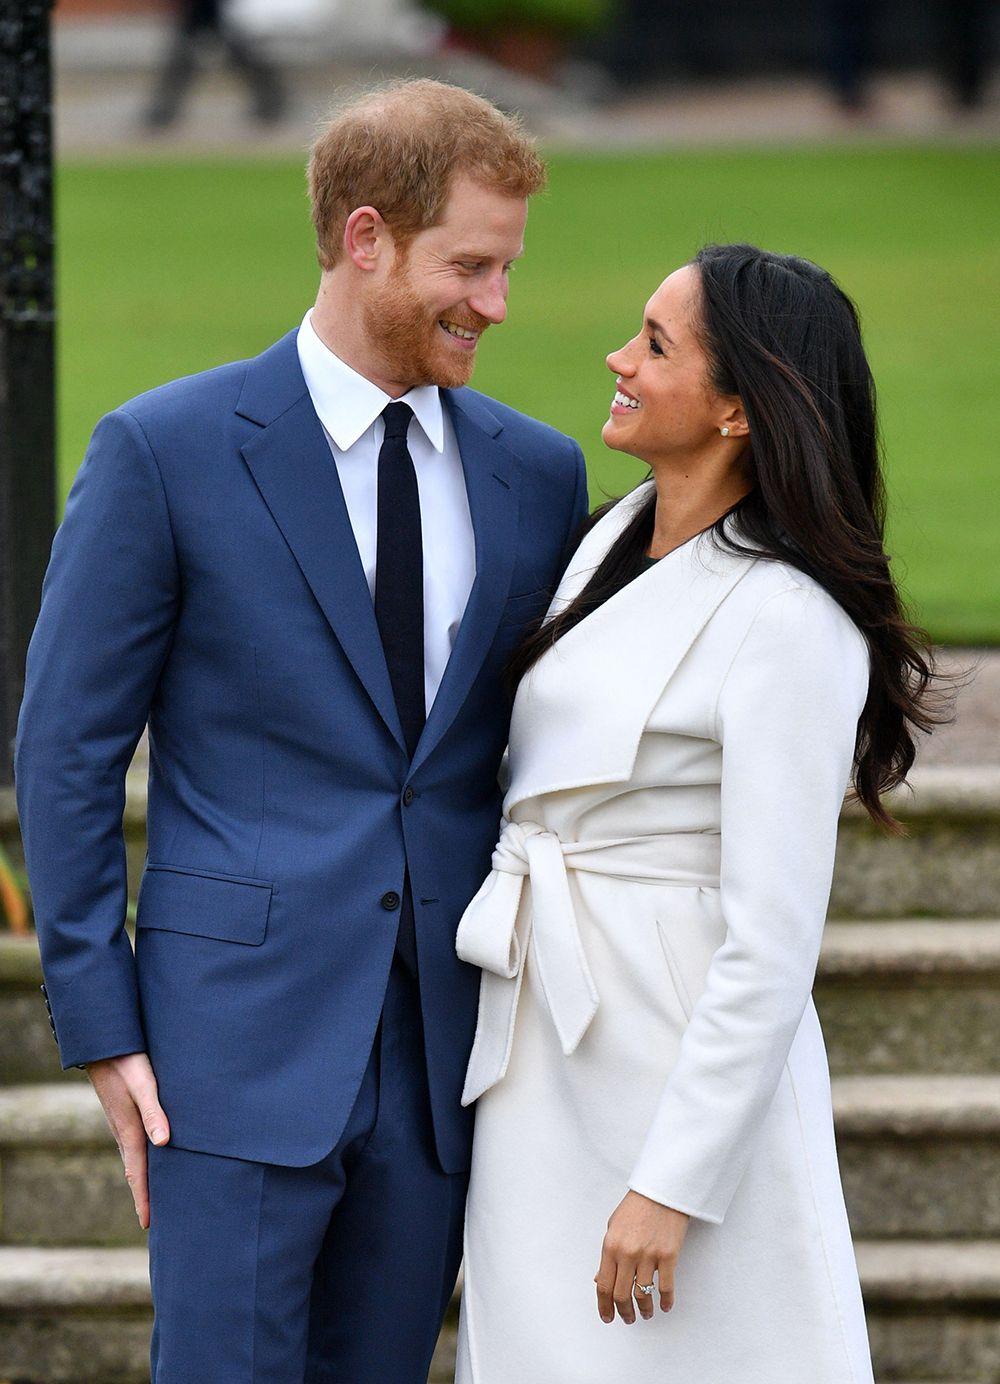 Prince Harry and Meghan Markle engagement announcement, Kensington Palace, London, UK – Nov. 27, 2017